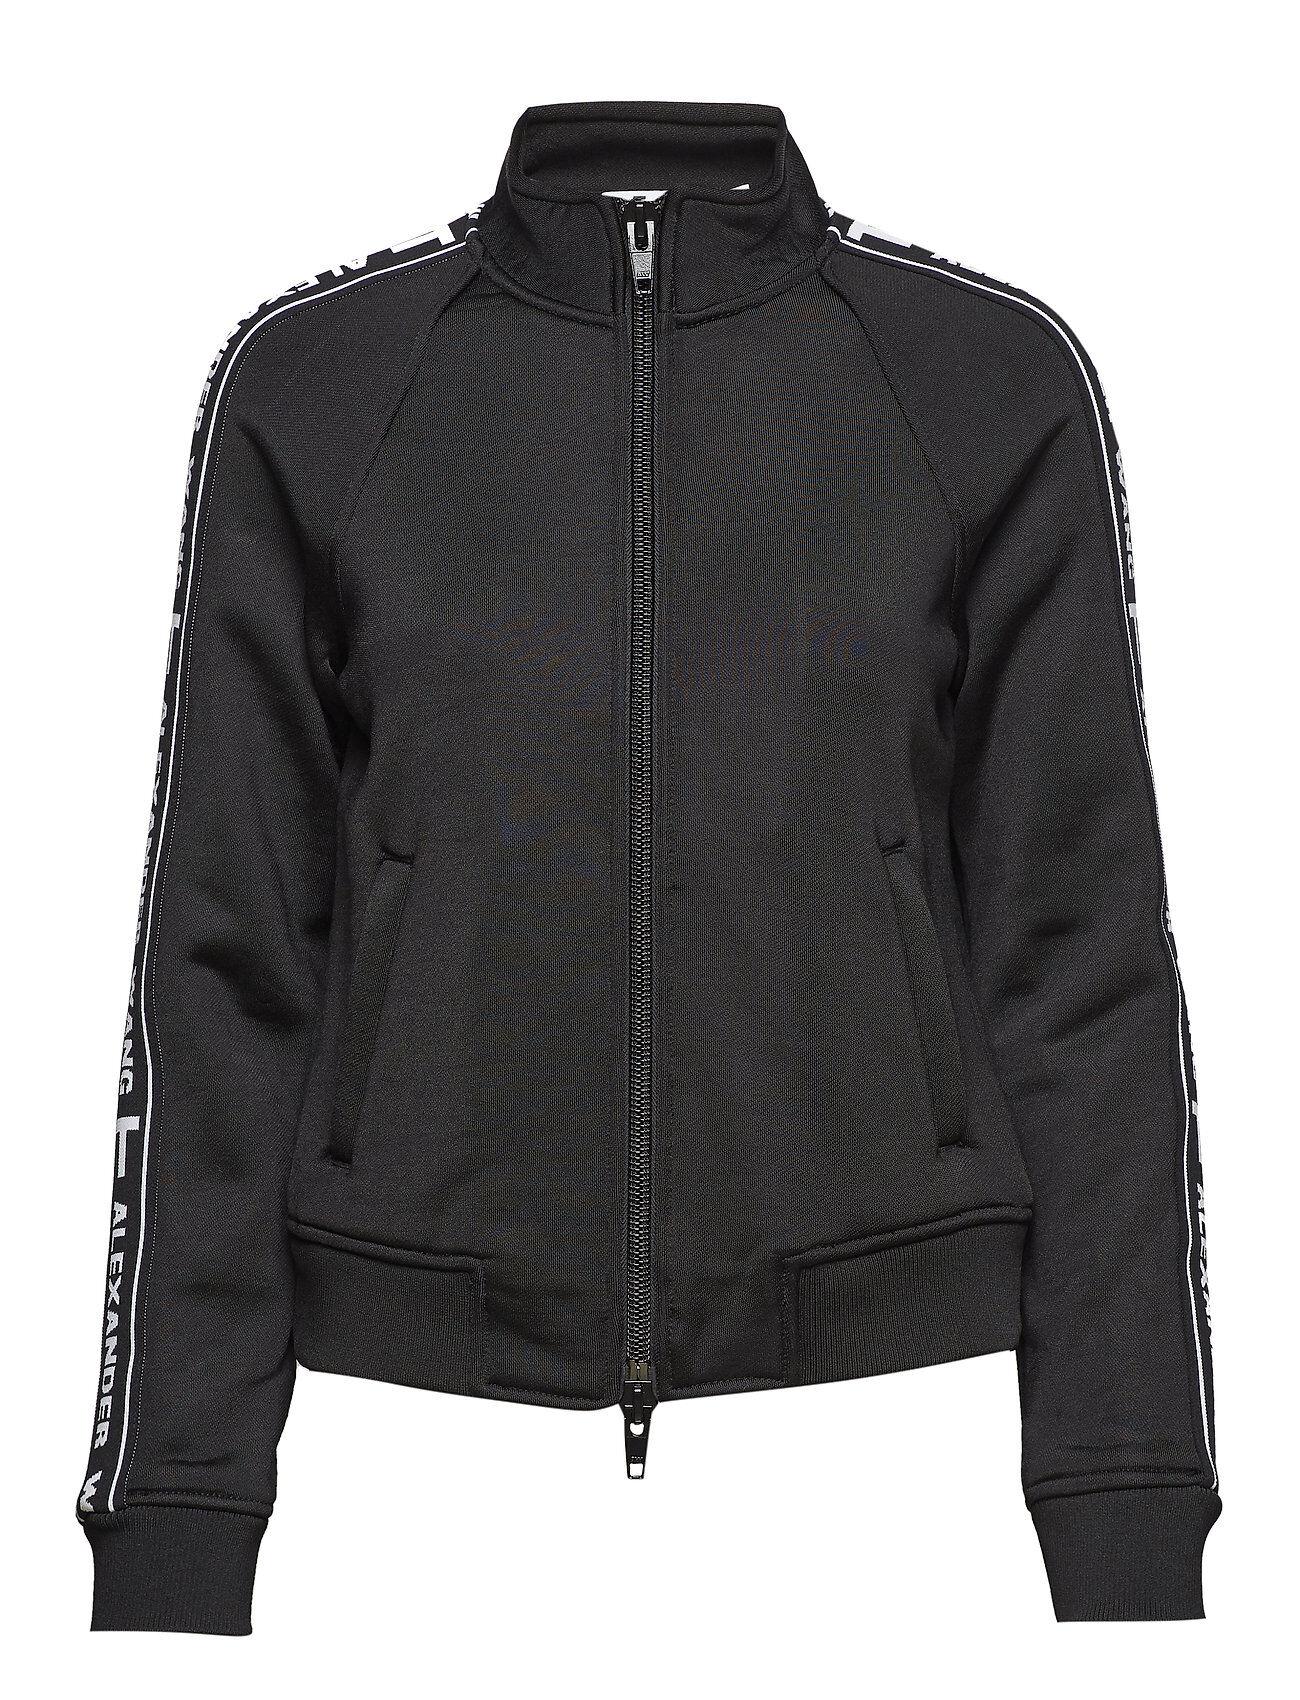 T by Alexander Wang Sleek French Terry Full-Zip Shrunken Track Jacket